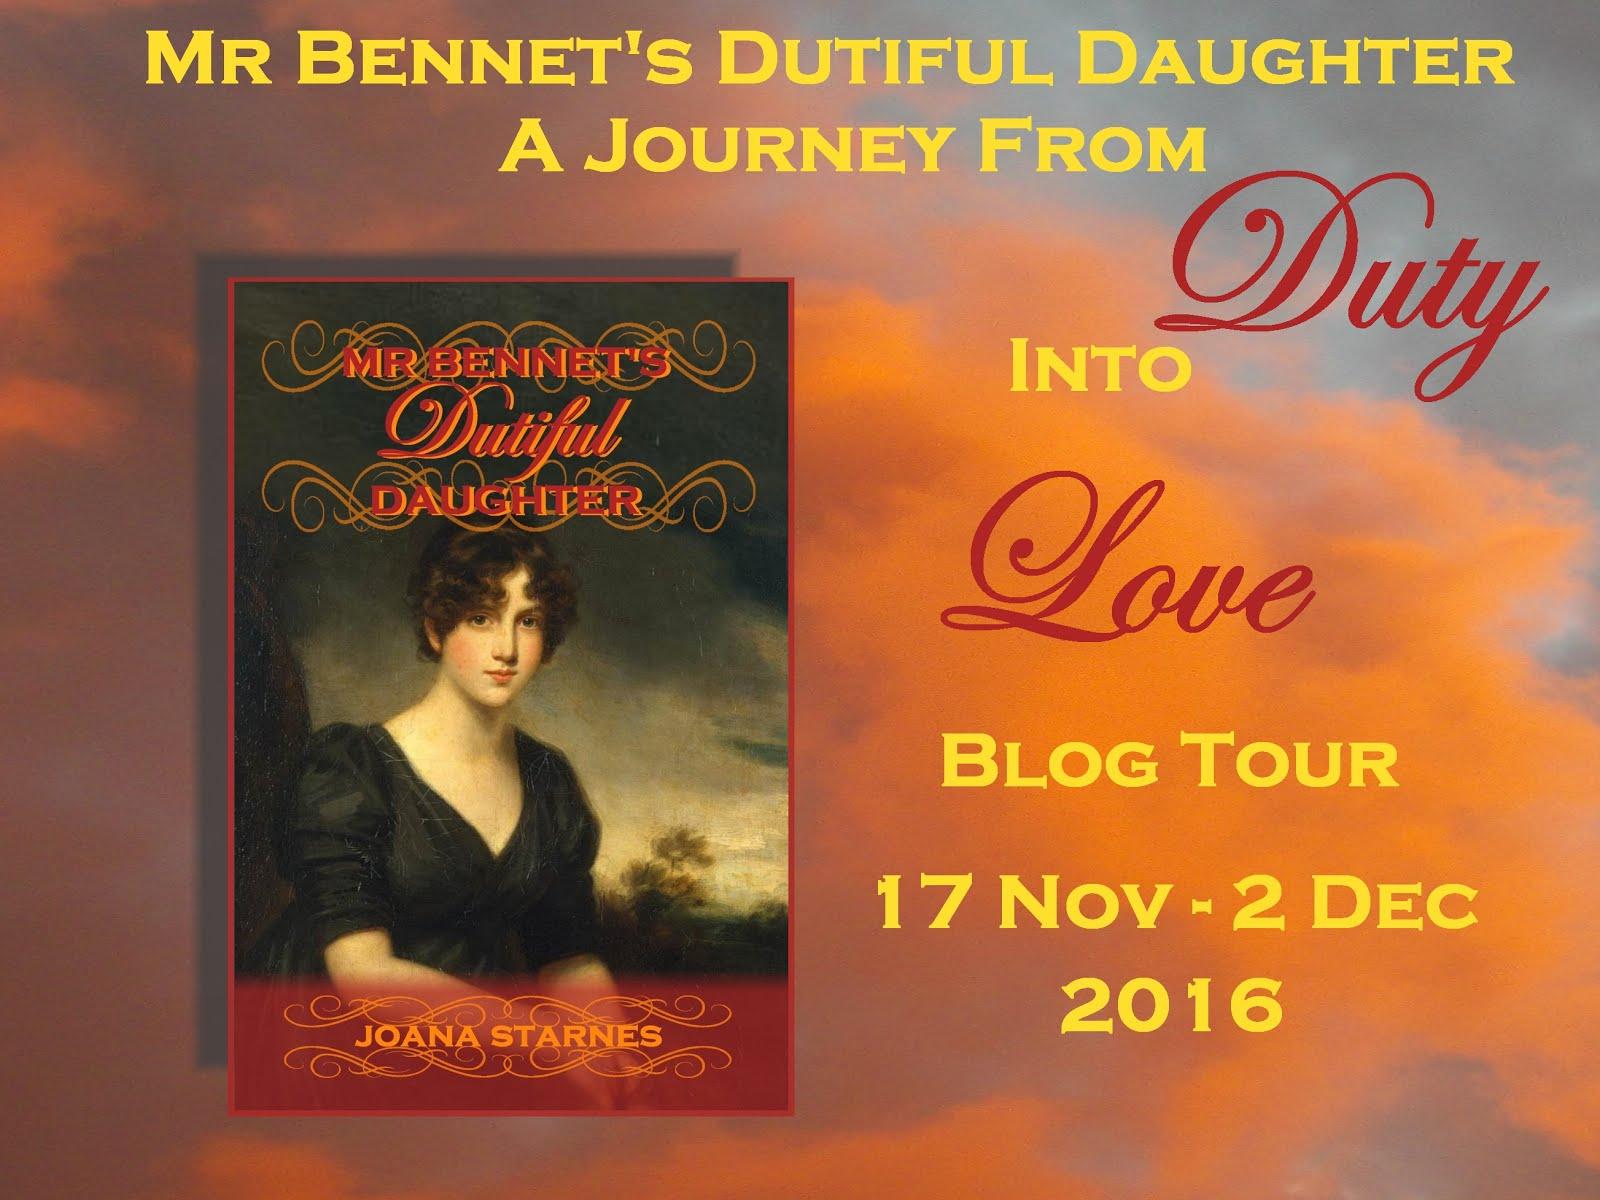 Mr Bennet's Dutiful Daughter by Joana Starnes